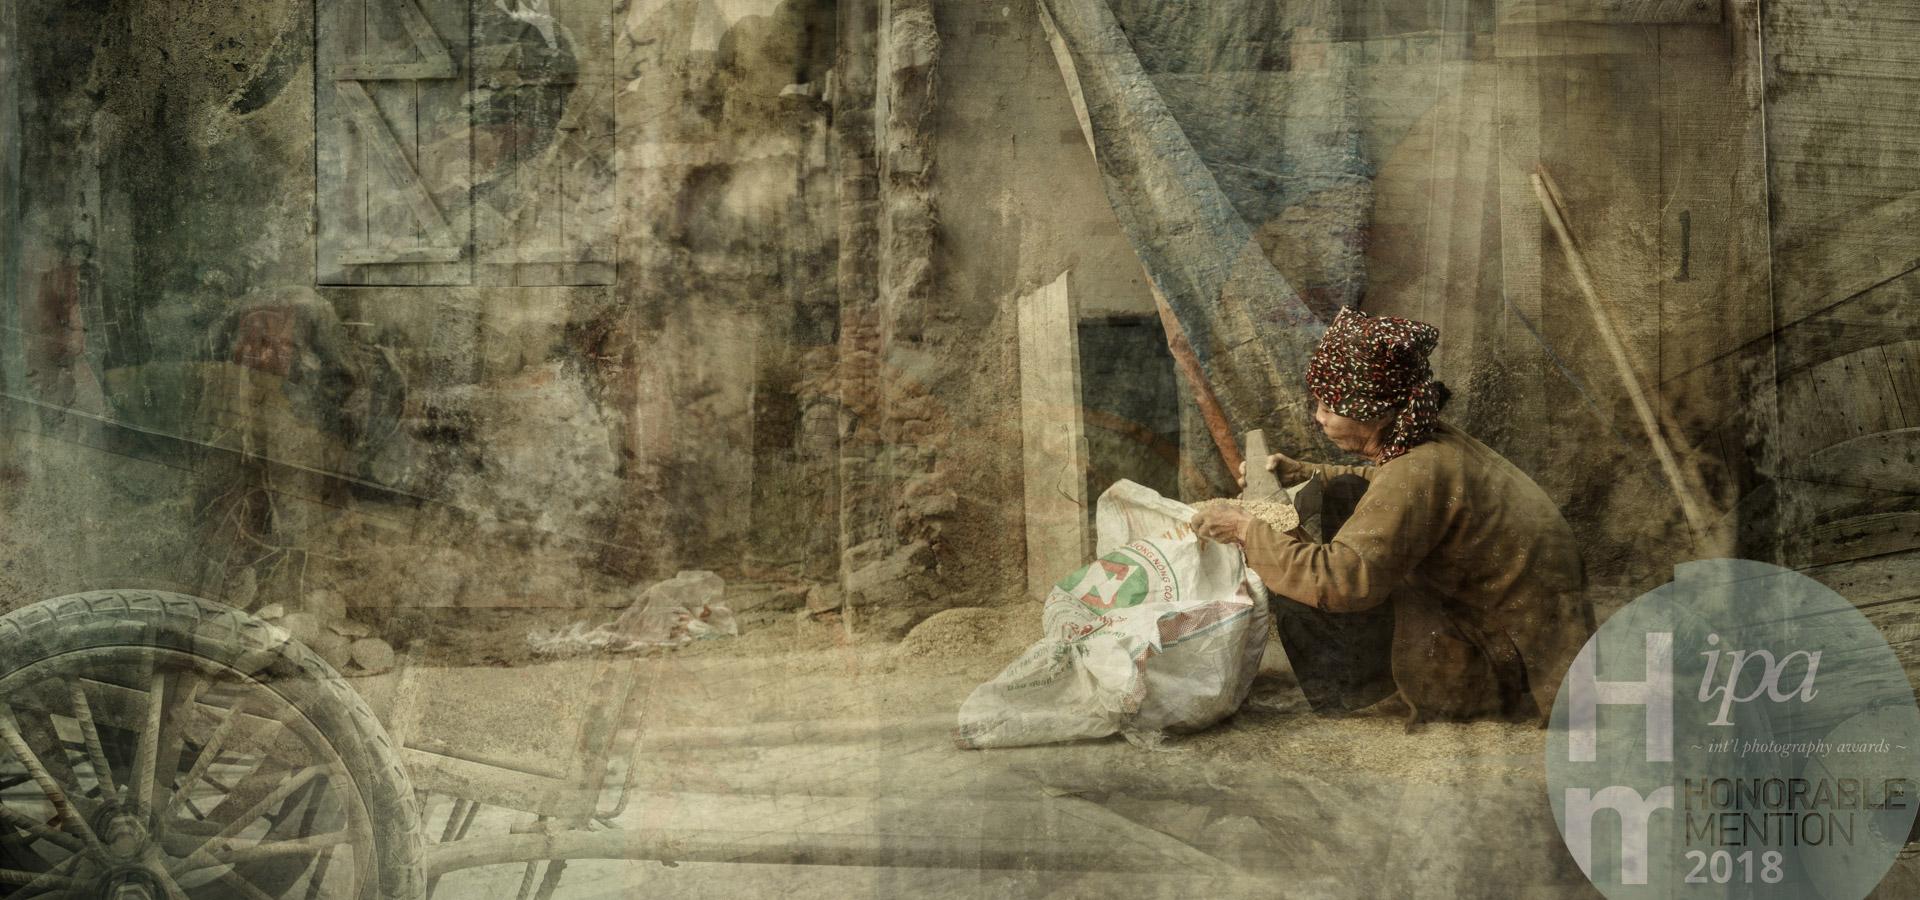 Xom Dong - Hanoi series - IPA 2018 winner - Riccardo Magherini Fine Art